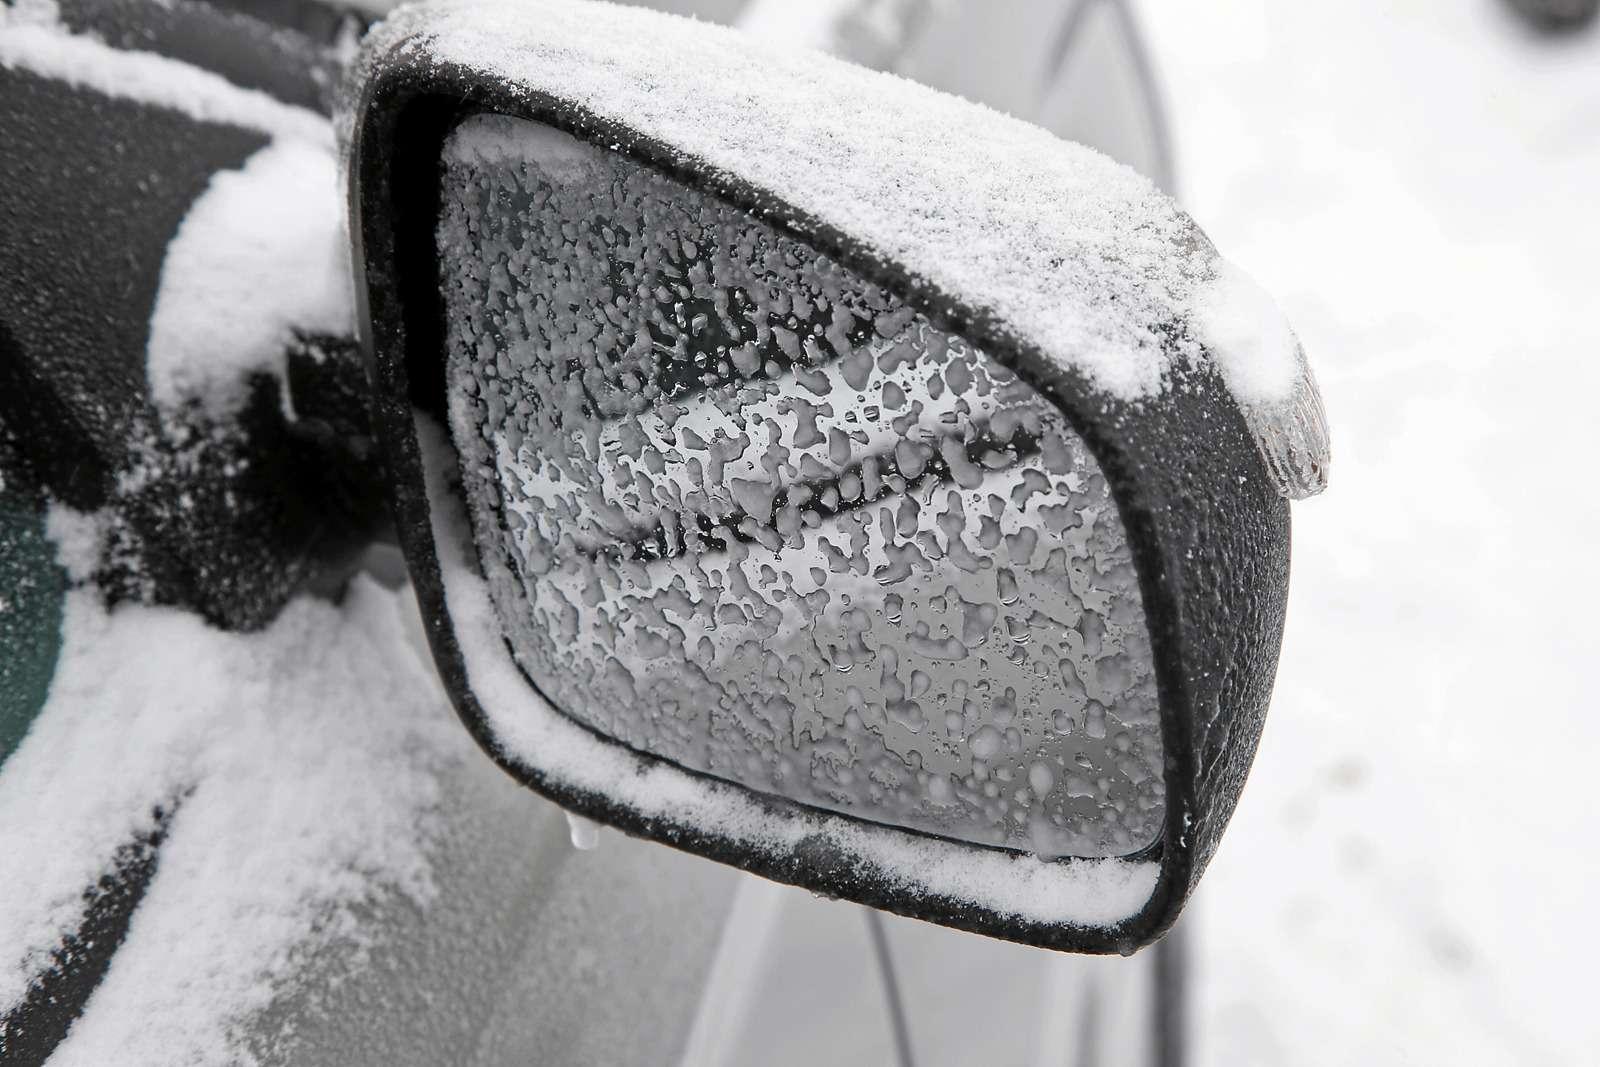 Большой зимний тест: Lada Vesta, Lada XRAY иDatsun mi-DO изпарка ЗР— фото 571418